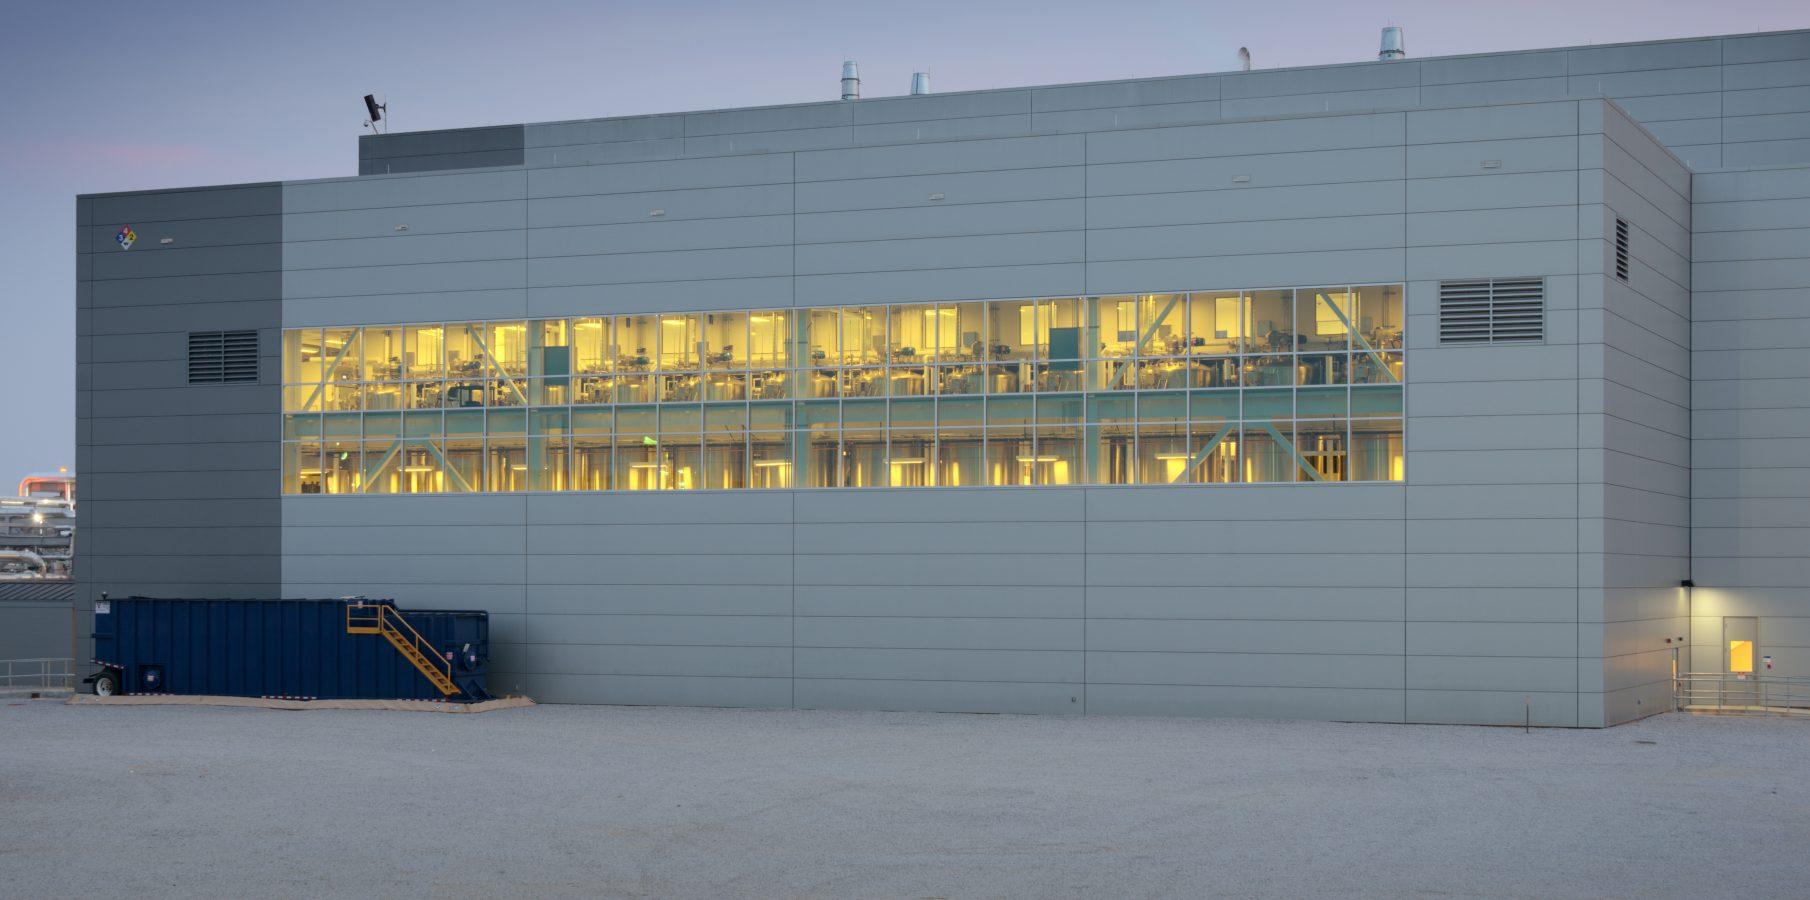 S&B – Fractionator Building